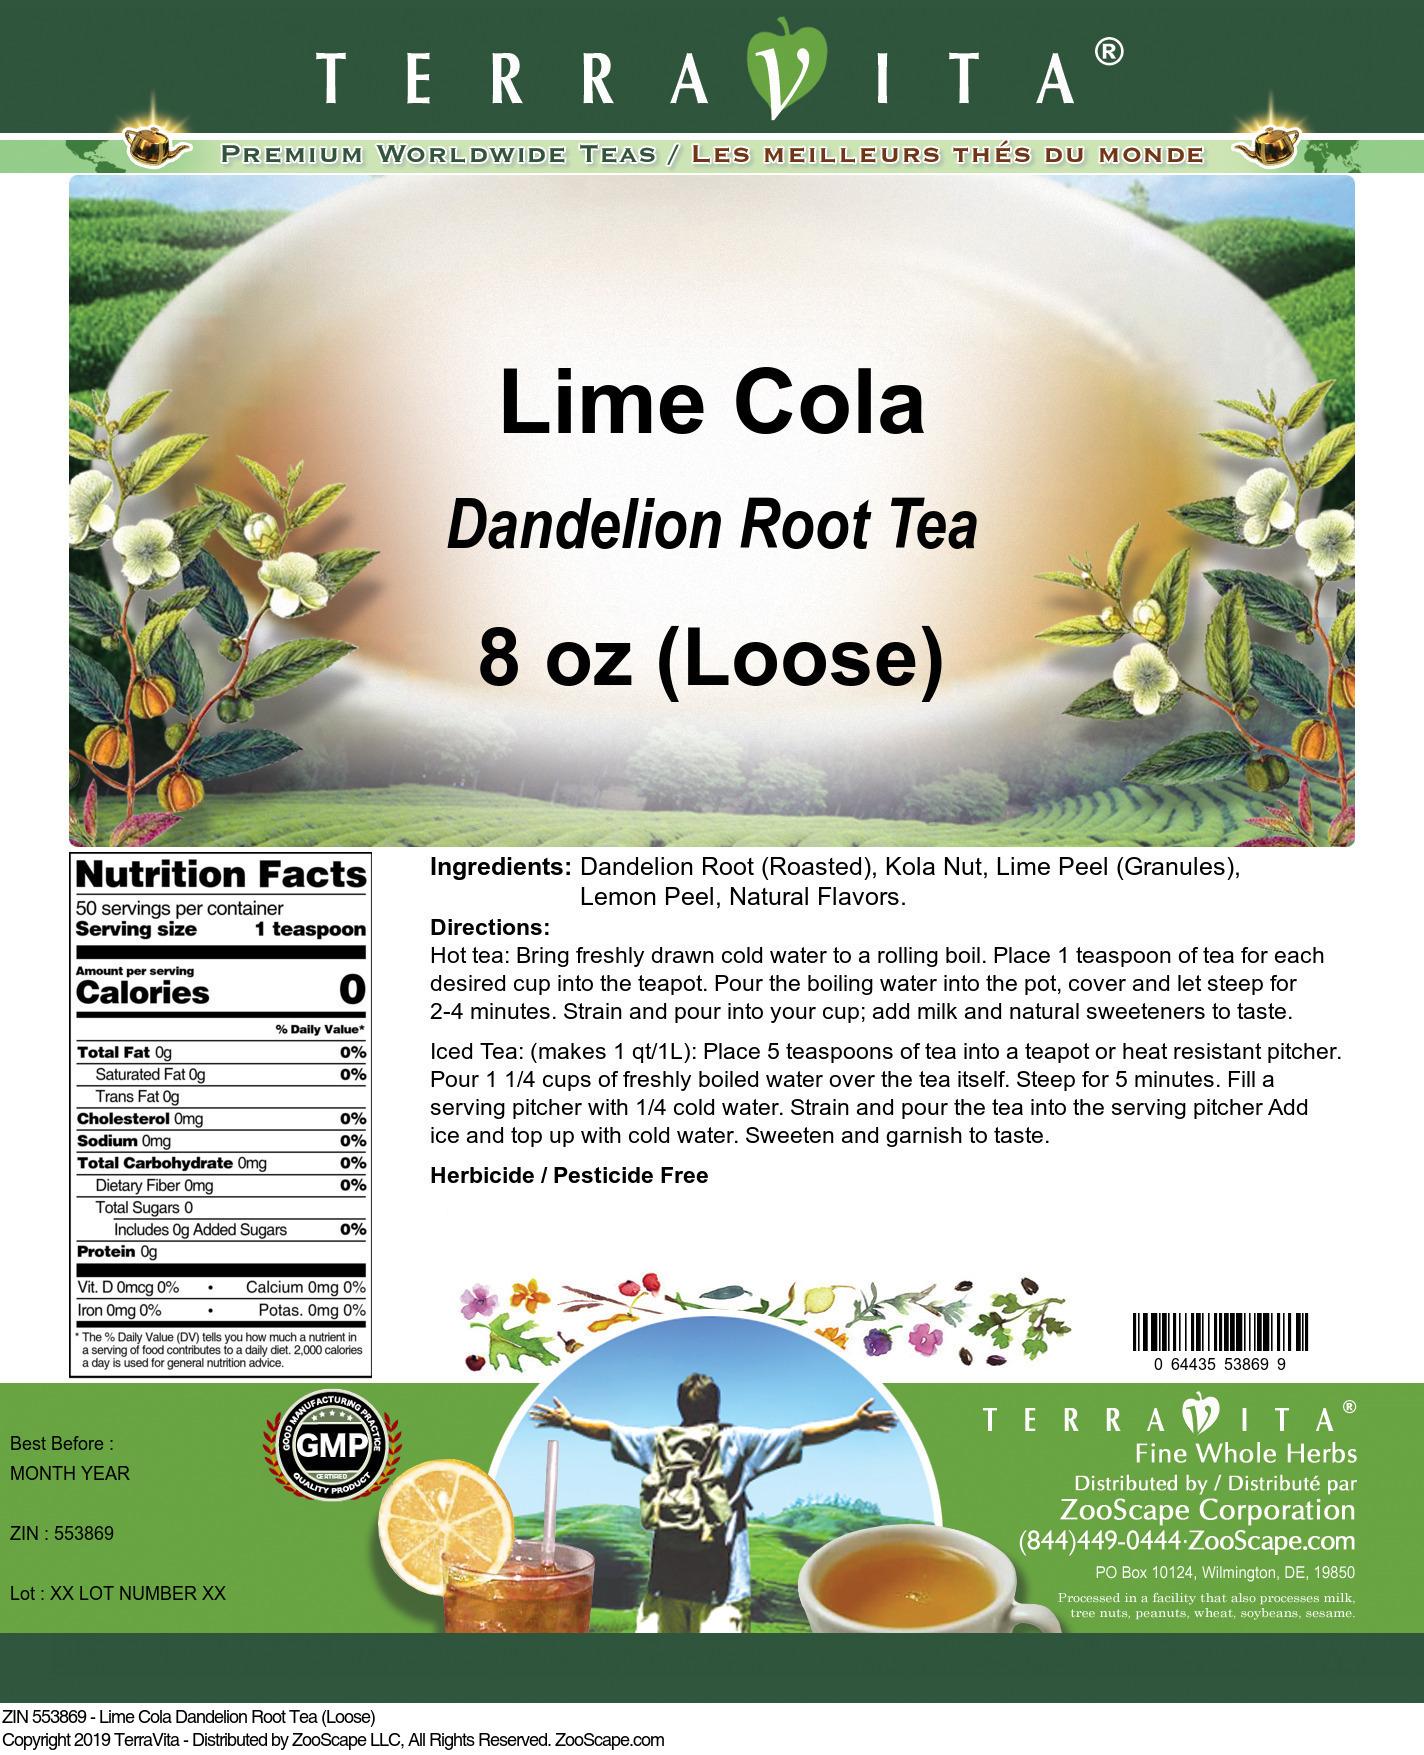 Lime Cola Dandelion Root Tea (Loose)